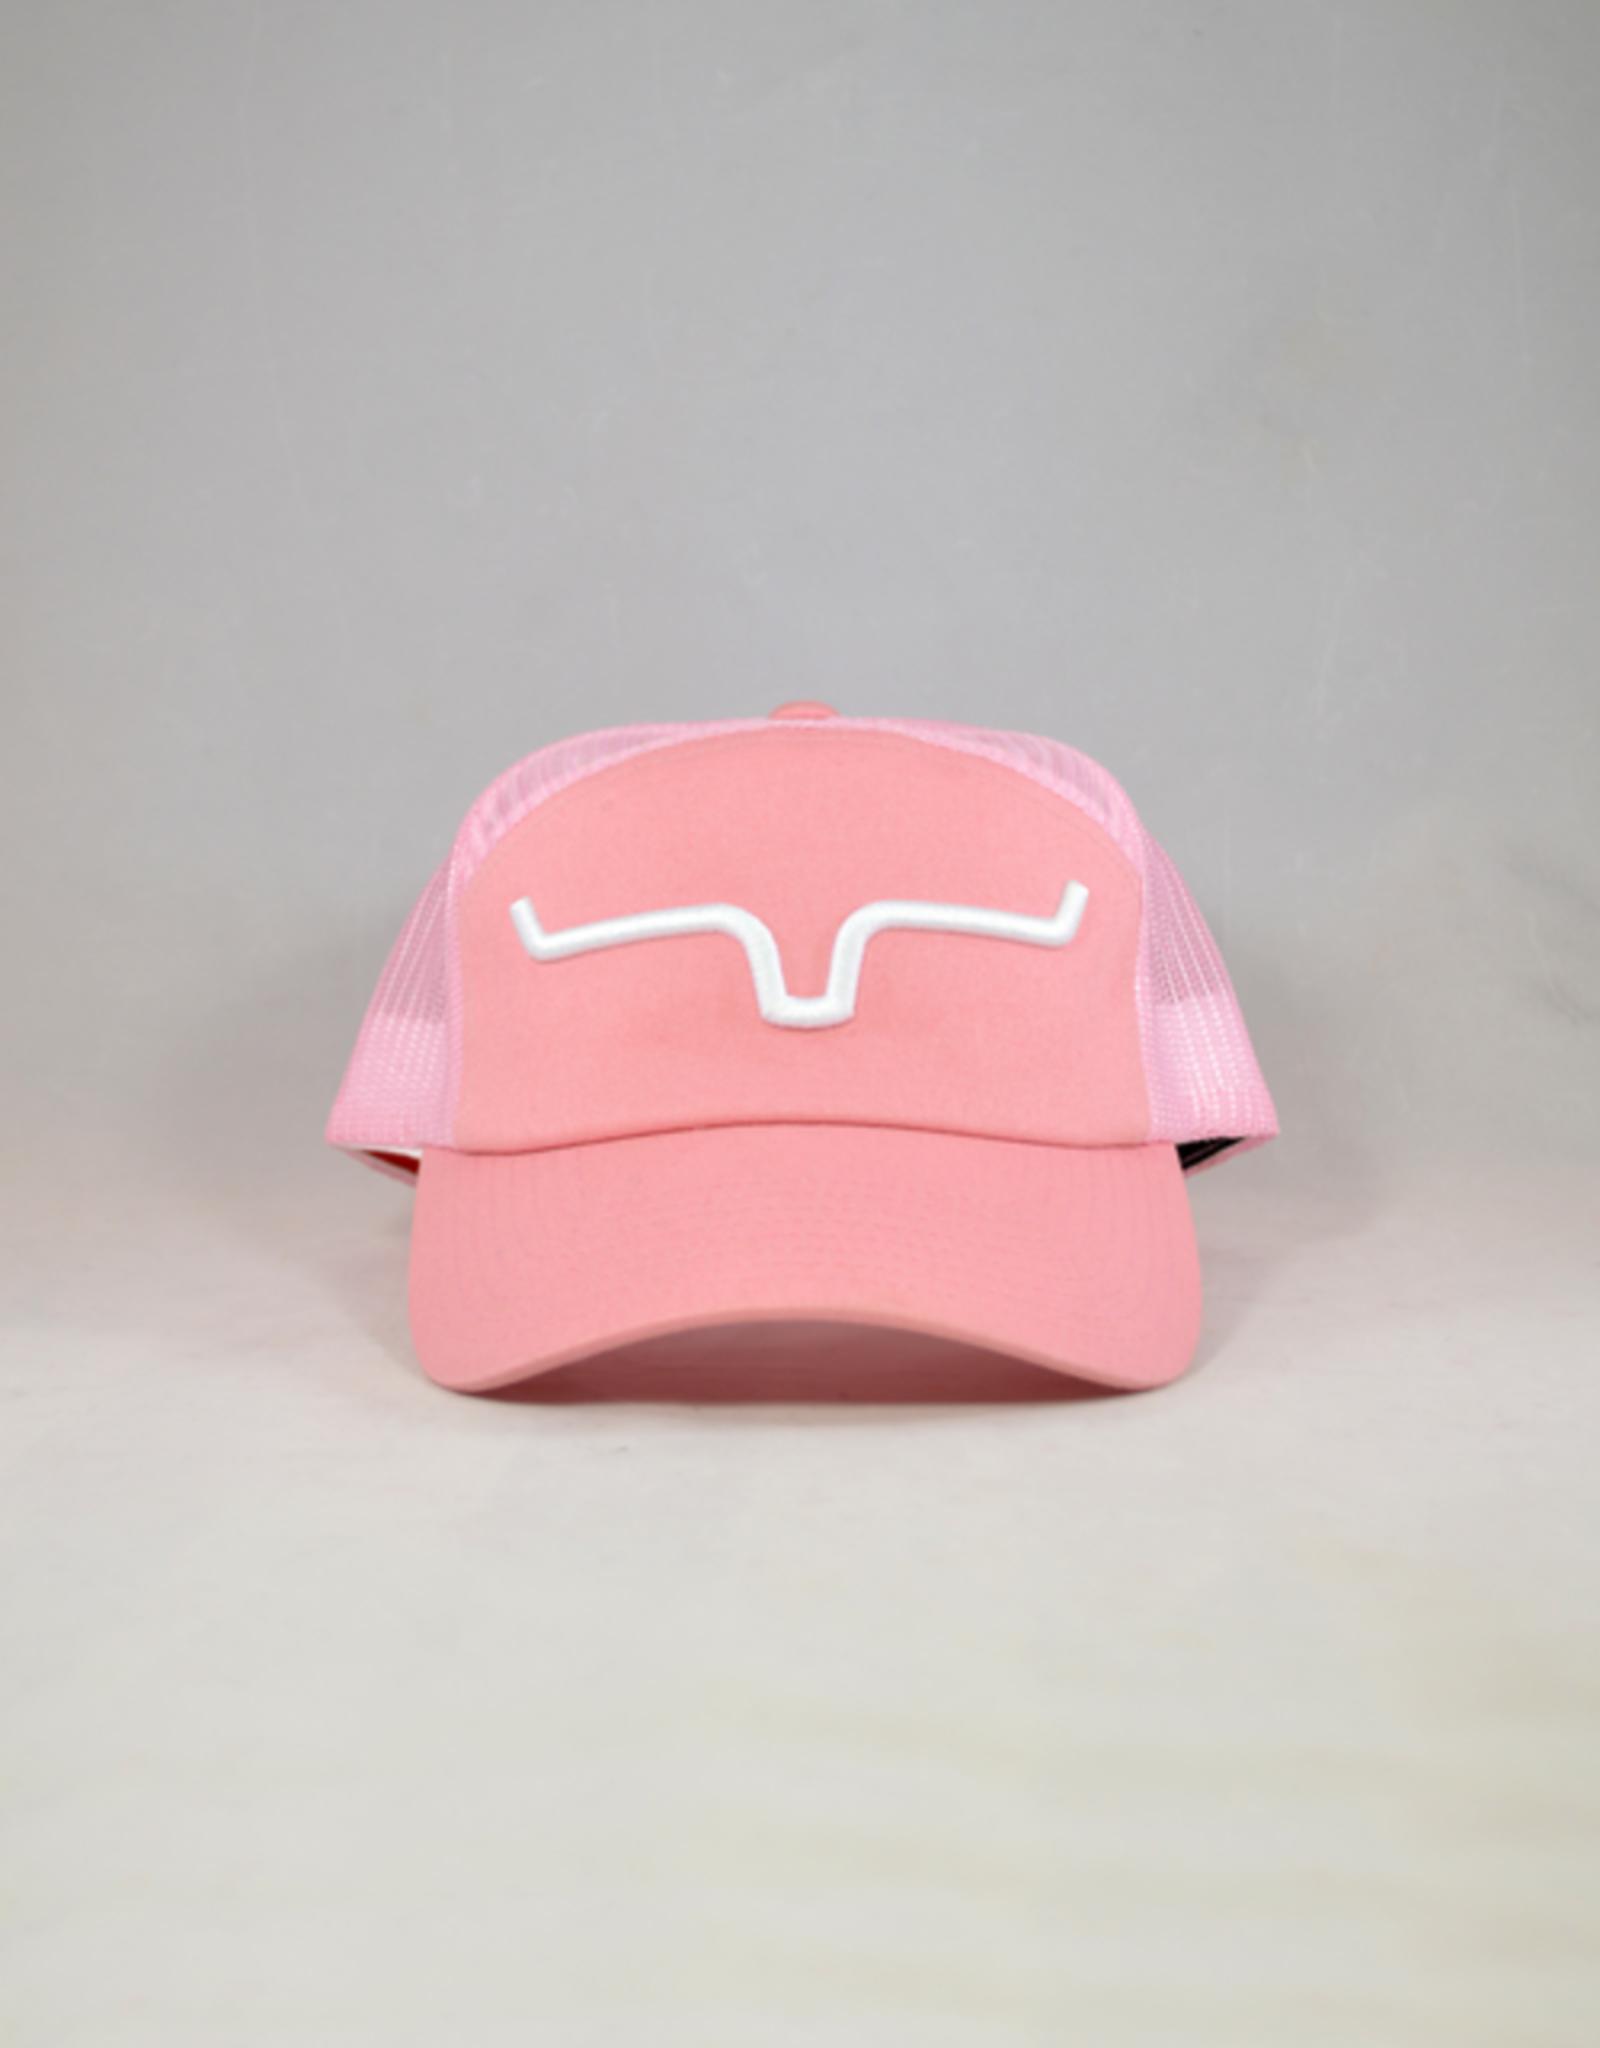 Kimes Ranch Kimes Ranch Factory Air Hybrid Cap, Pink